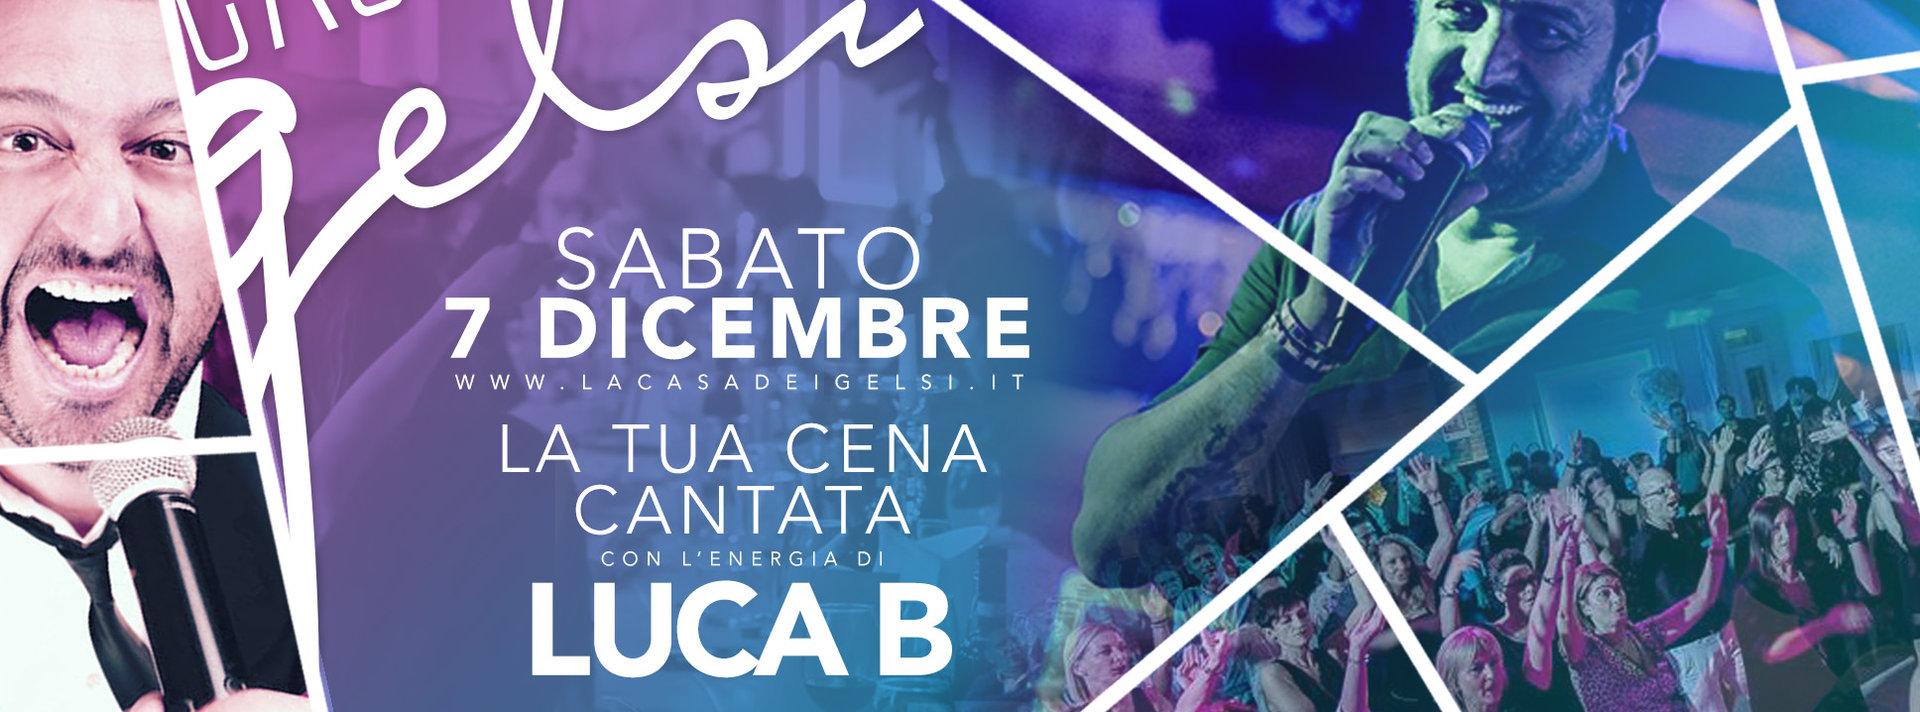 Luca b ai Gelsi - 7 dicembre 2019